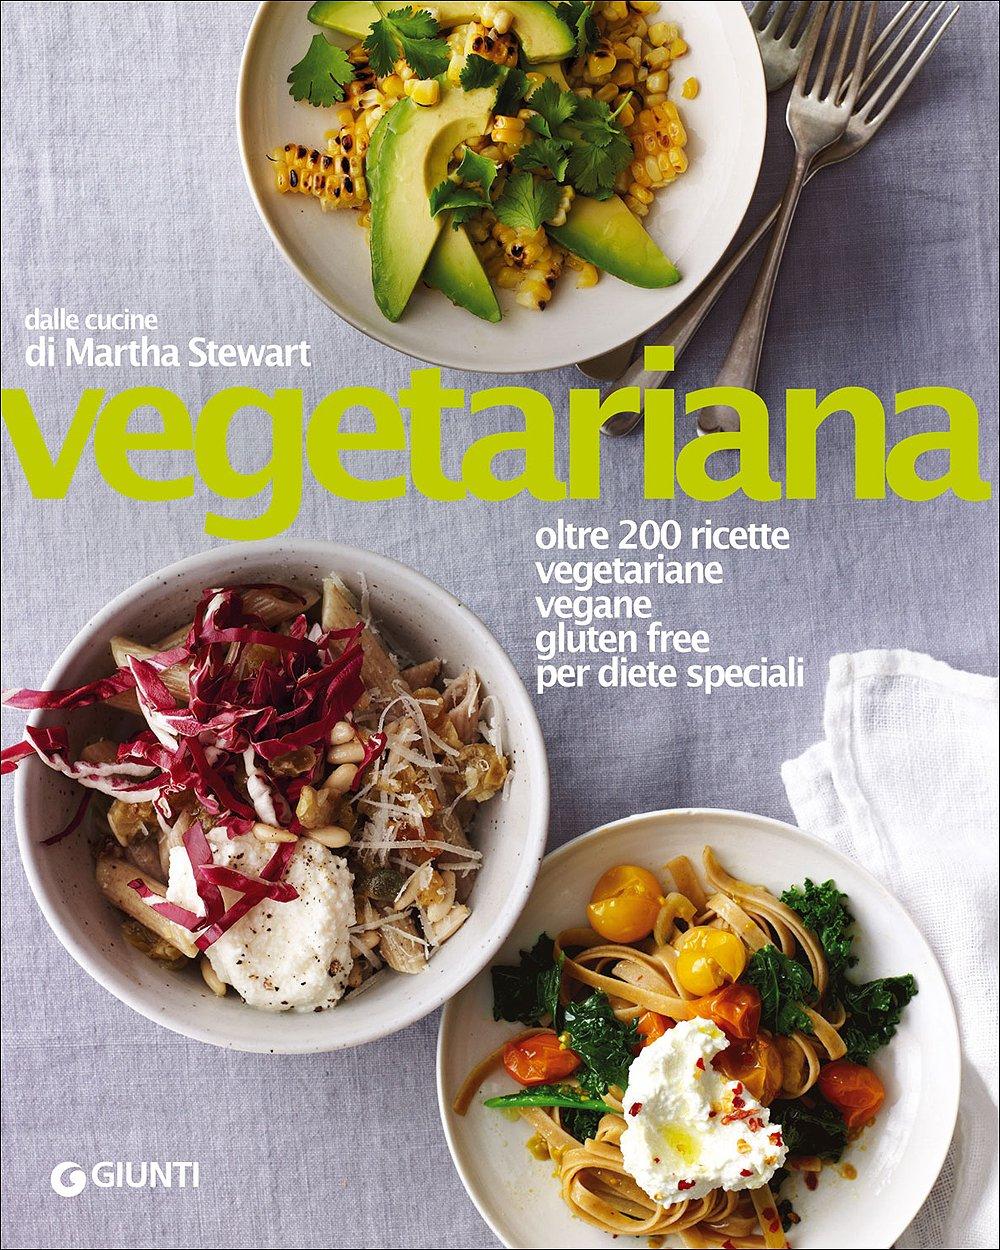 81XakPv4ZfL - Vegetariana